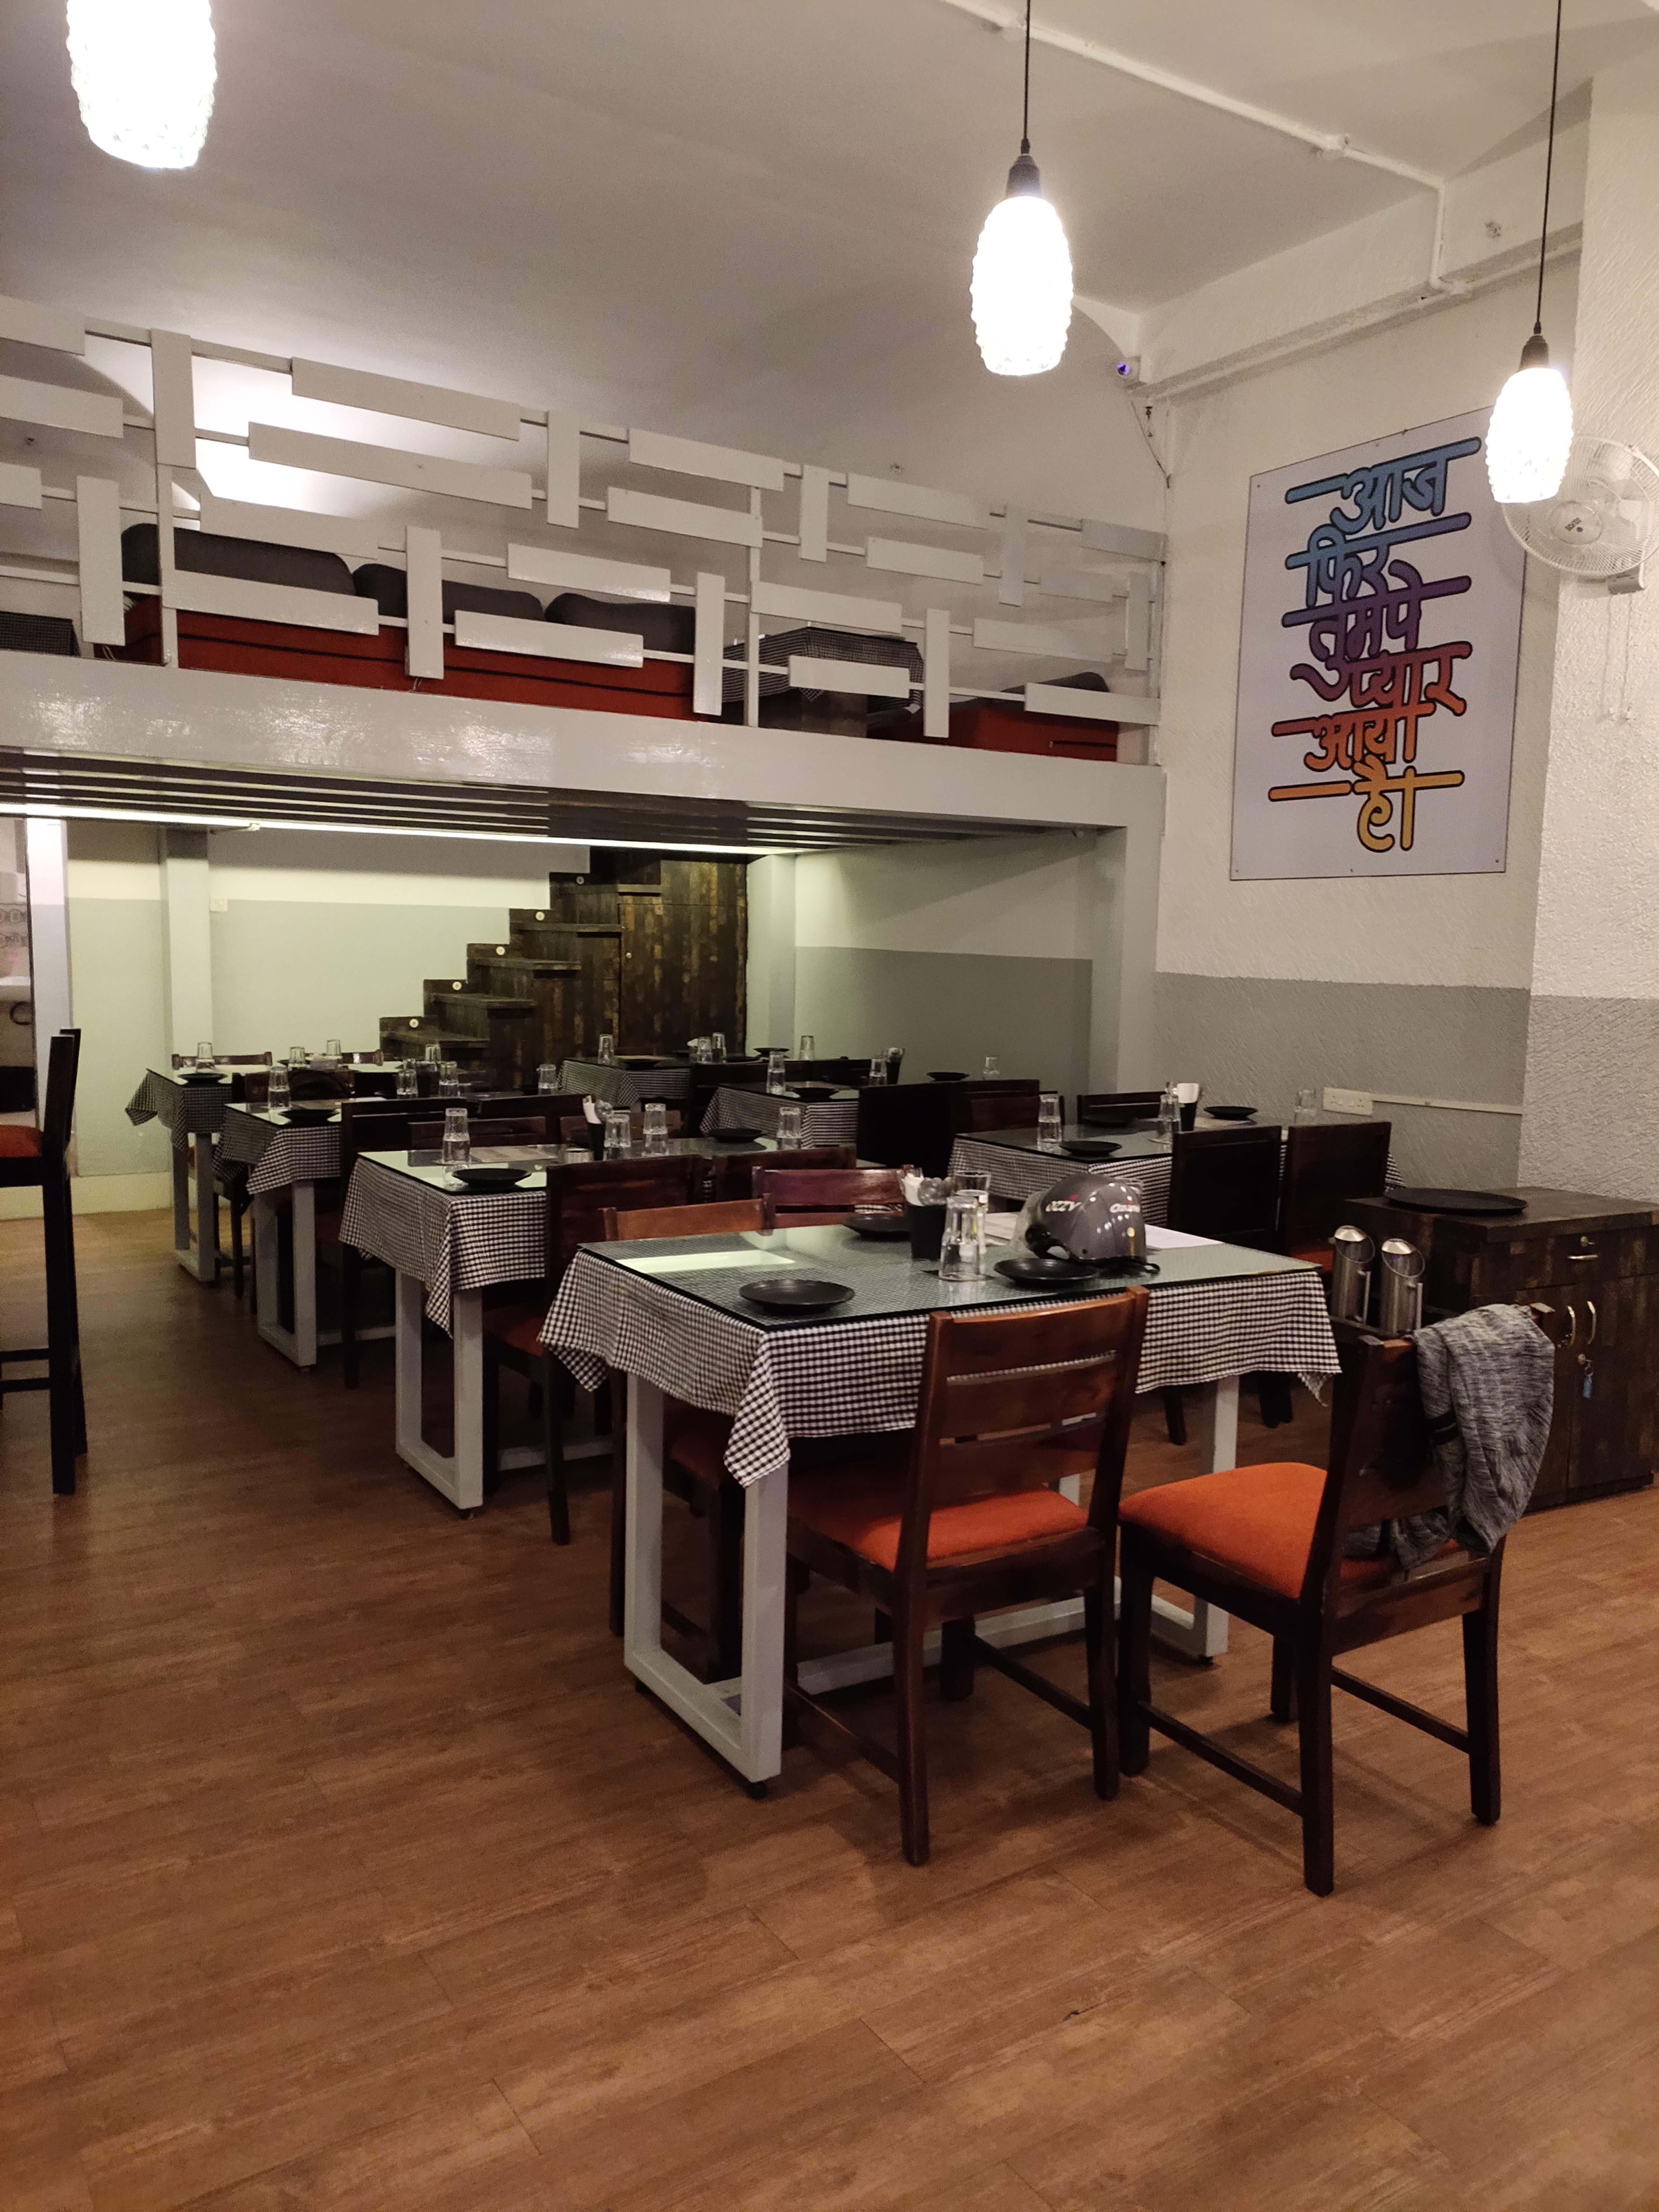 Restaurant,Room,Interior design,Floor,Building,Flooring,Table,Lighting,Cafeteria,Furniture